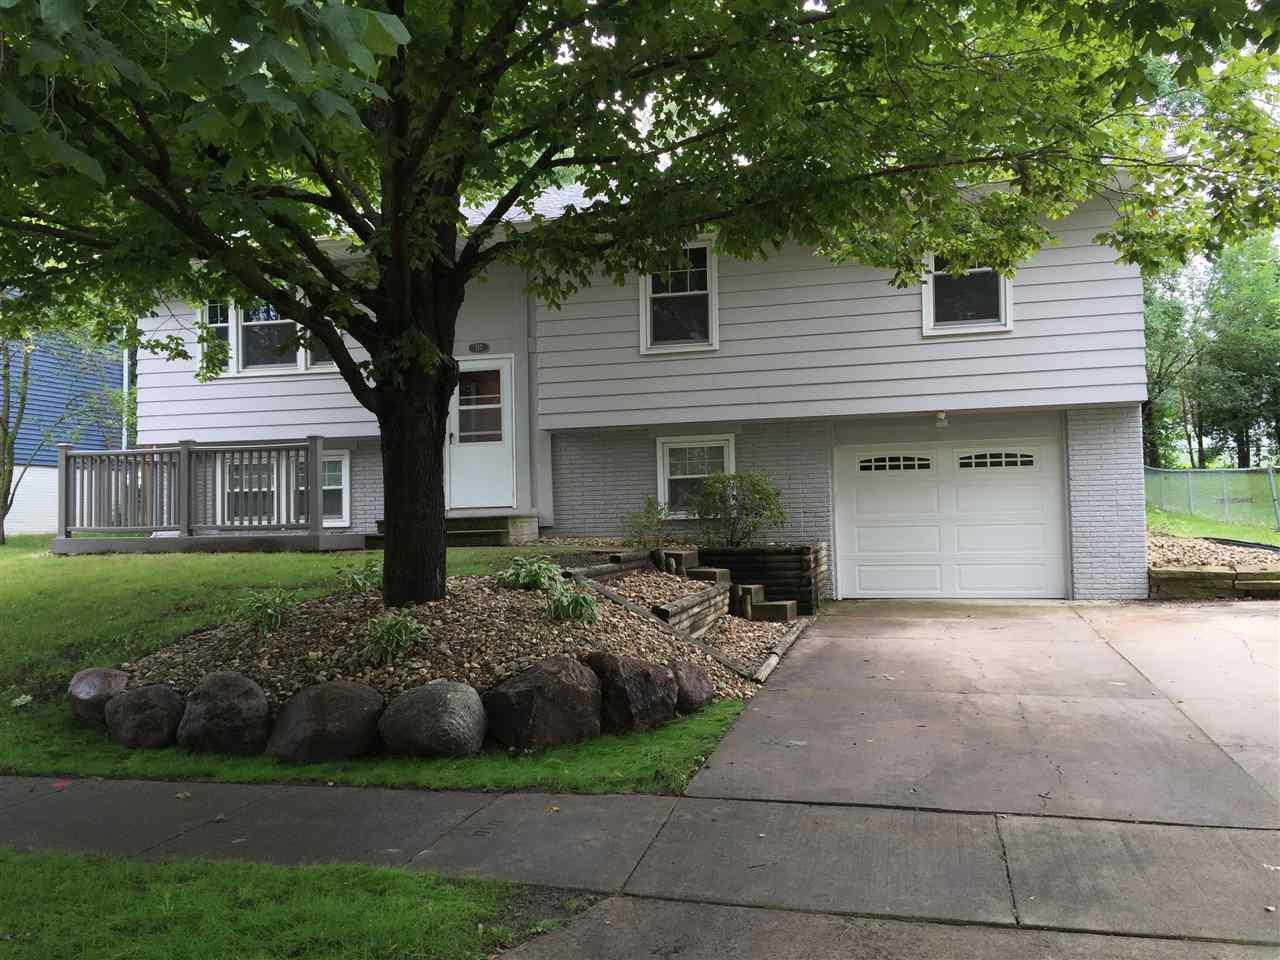 717 Lilac Cedar Falls Ia 50613 Mls 20154710 Amy Wienands Real Estate